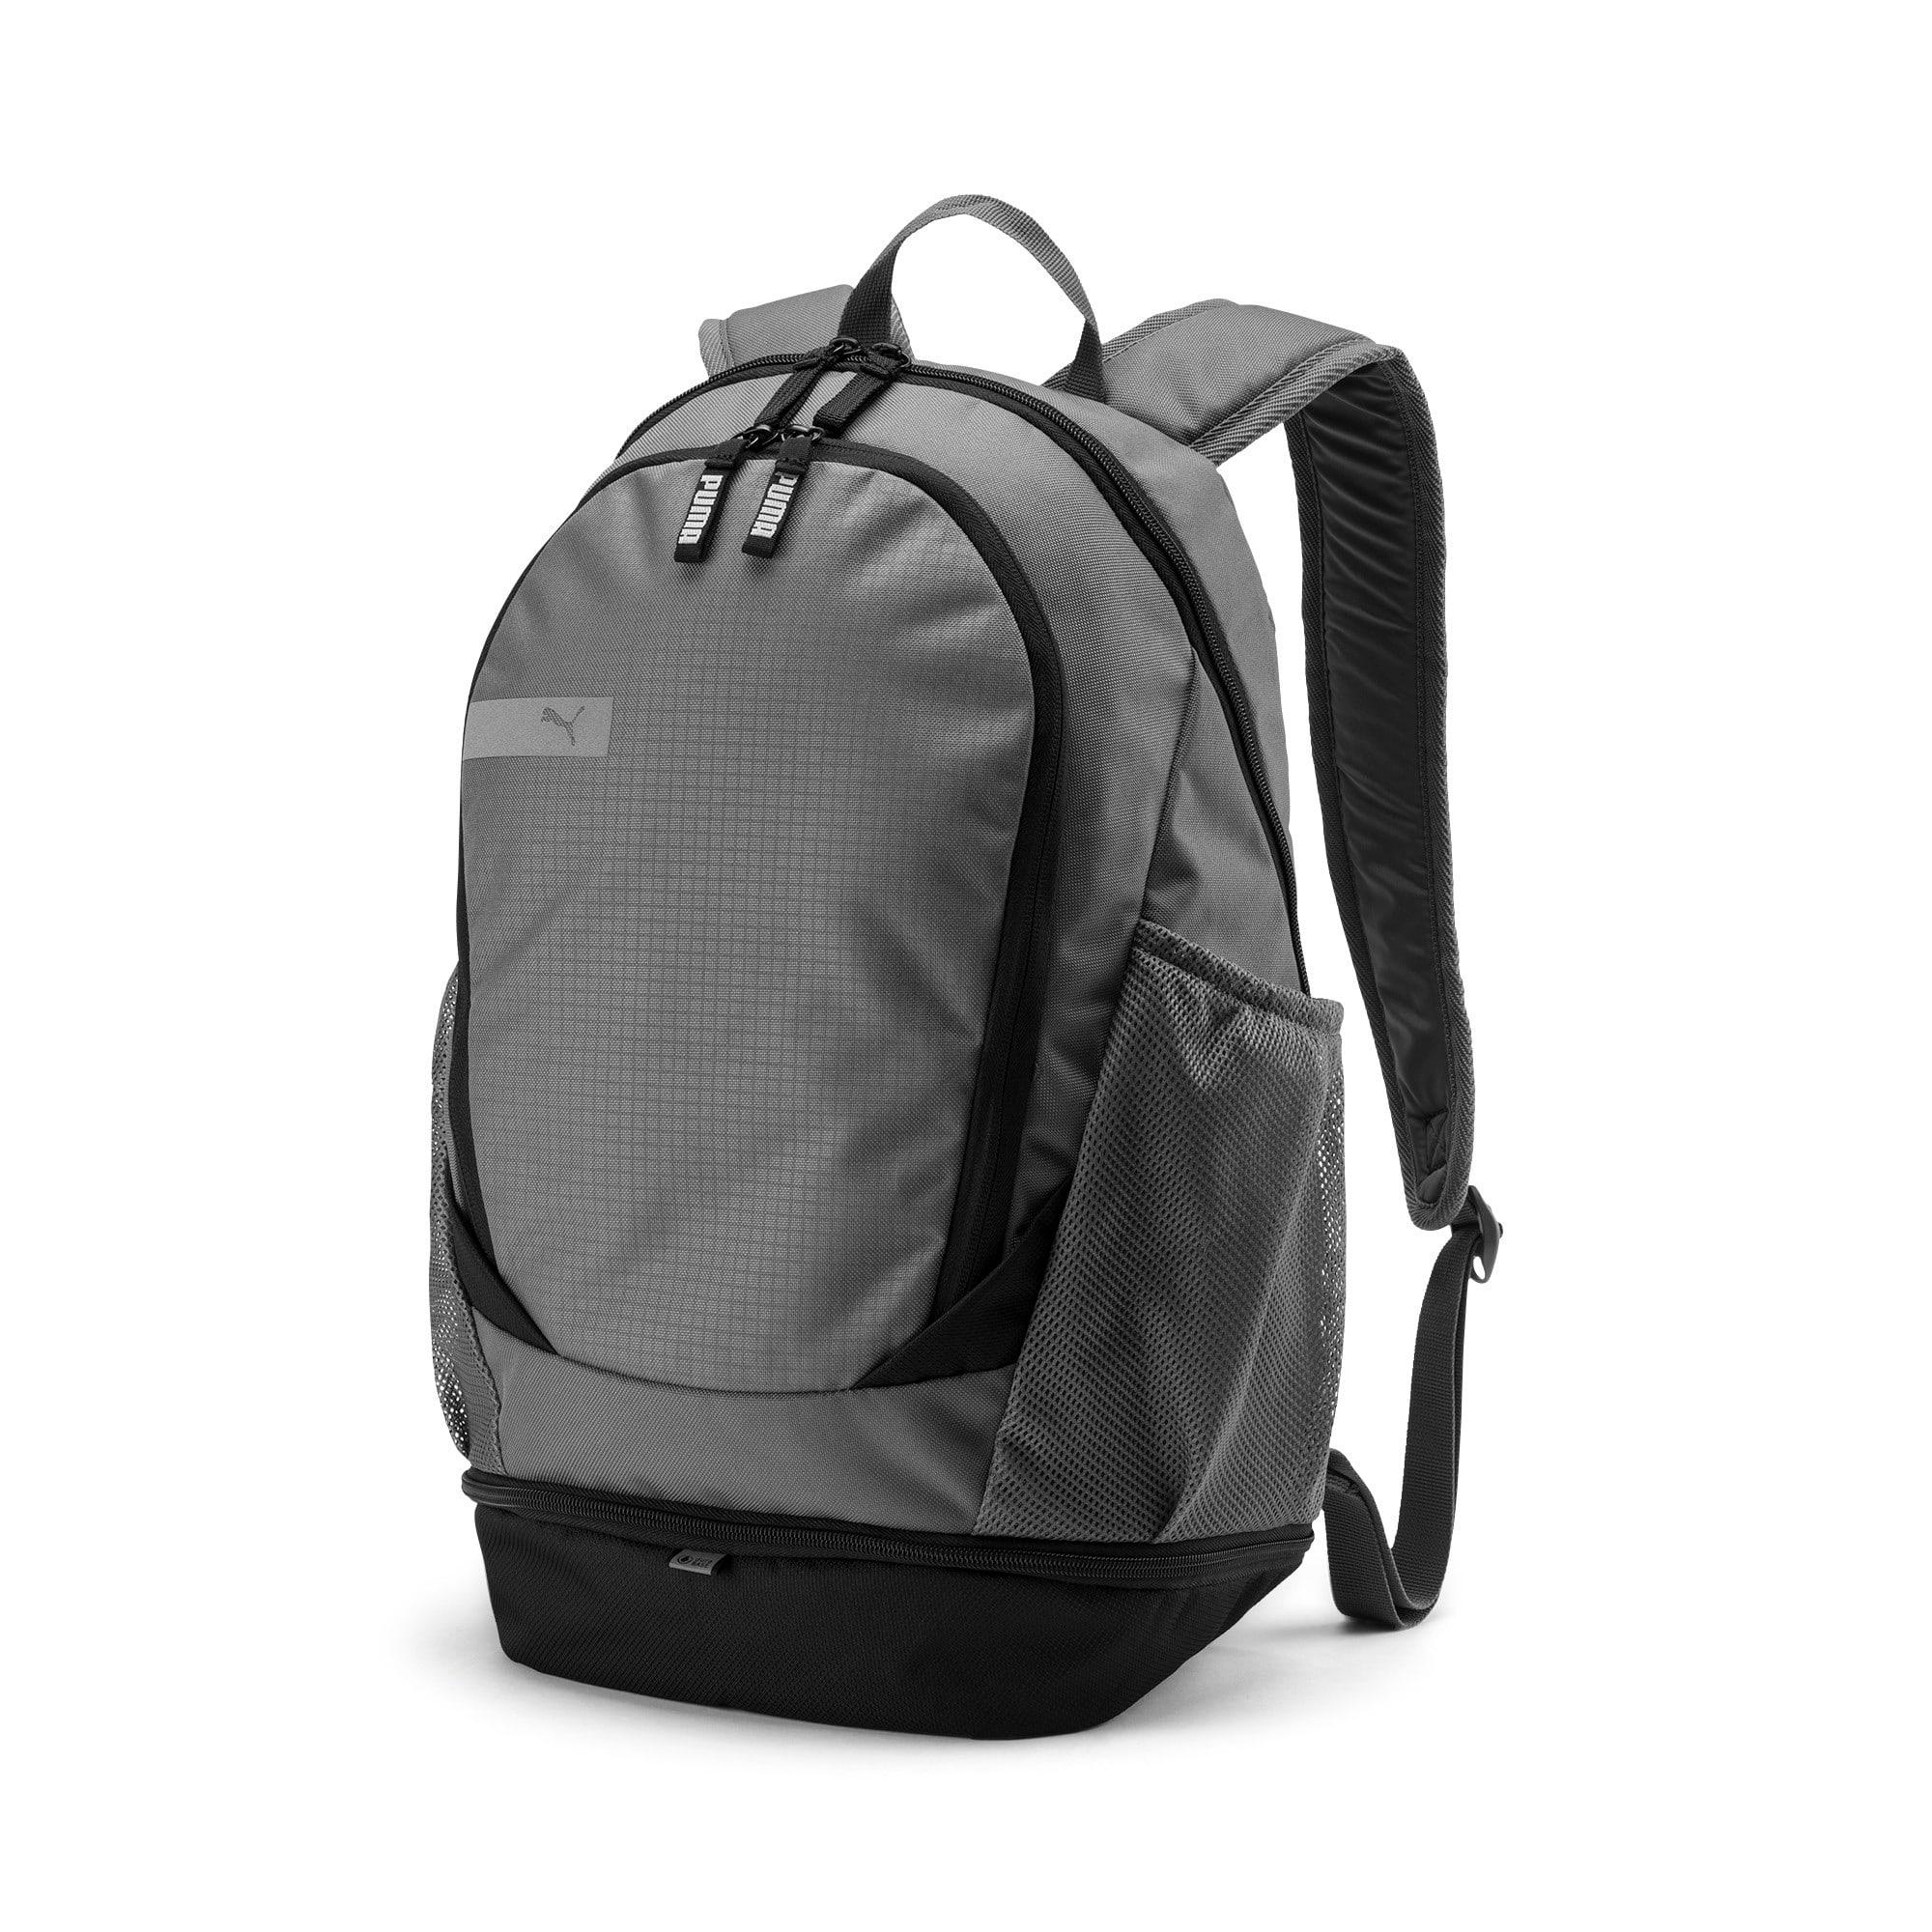 Thumbnail 1 of Vibe Backpack, CASTLEROCK, medium